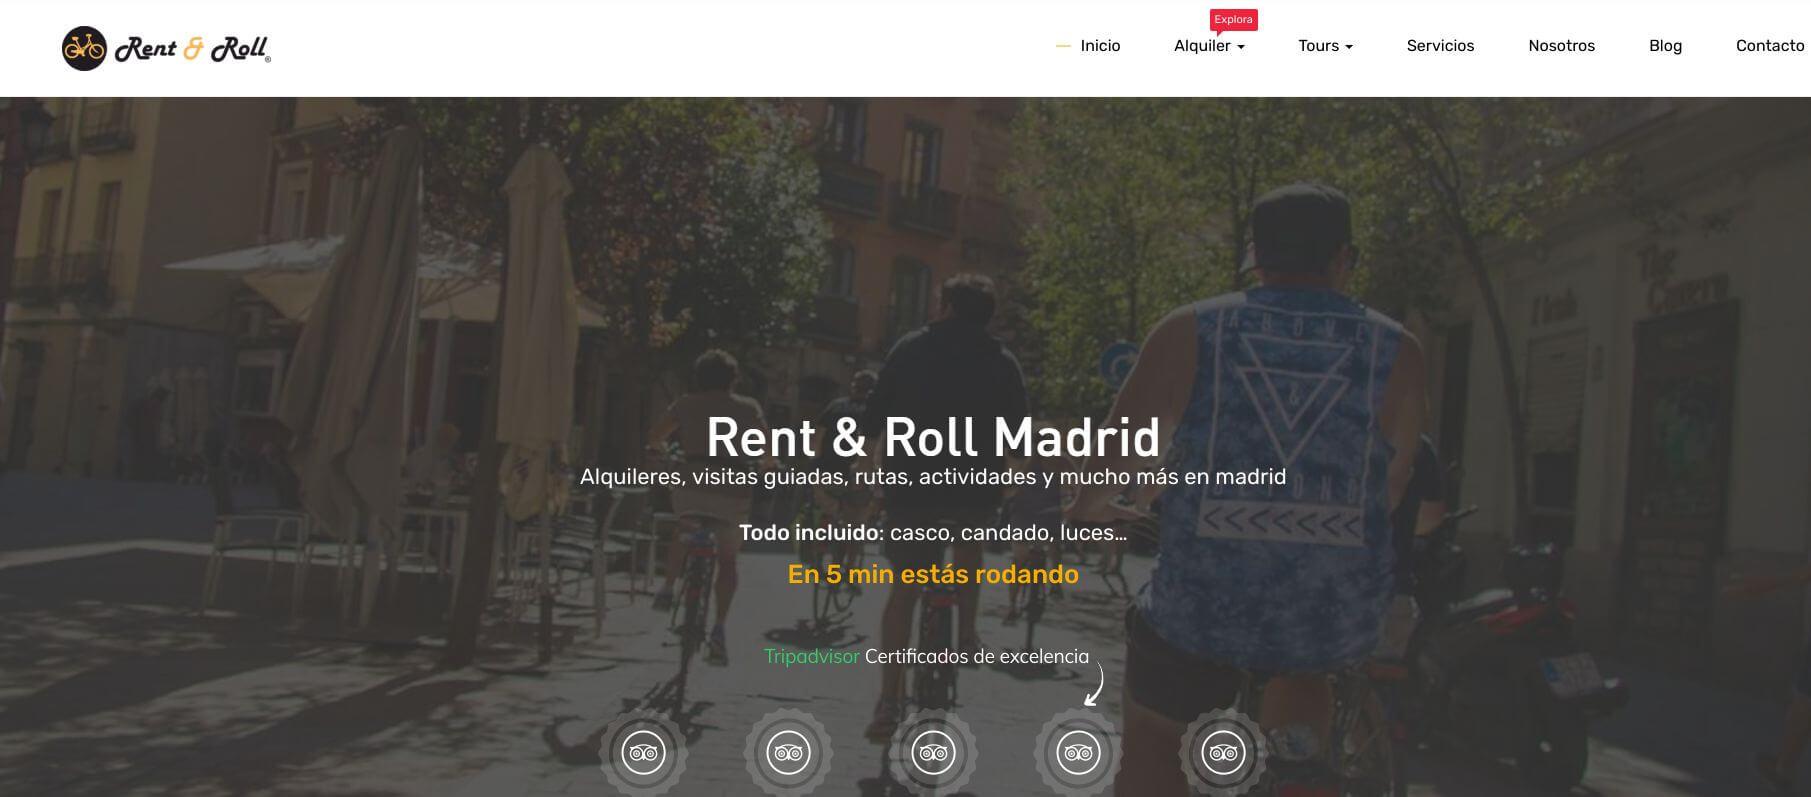 Los mejores tours en bicicleta de España